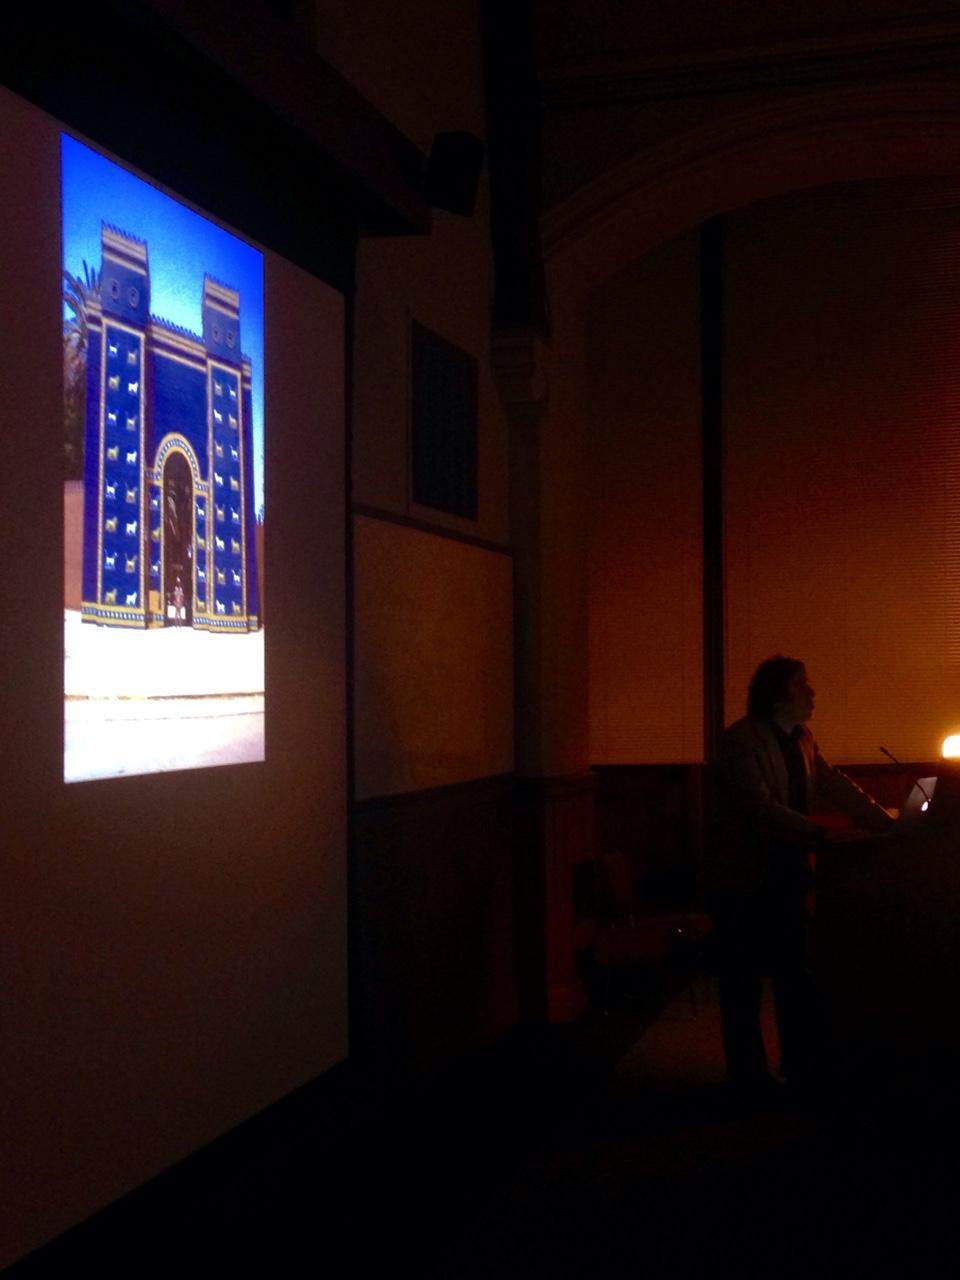 Michael Rakowitz delivering his lecture at Case Western Reserve University (photo by Jeremy David Bendik-Keymer) (click to enlarge)